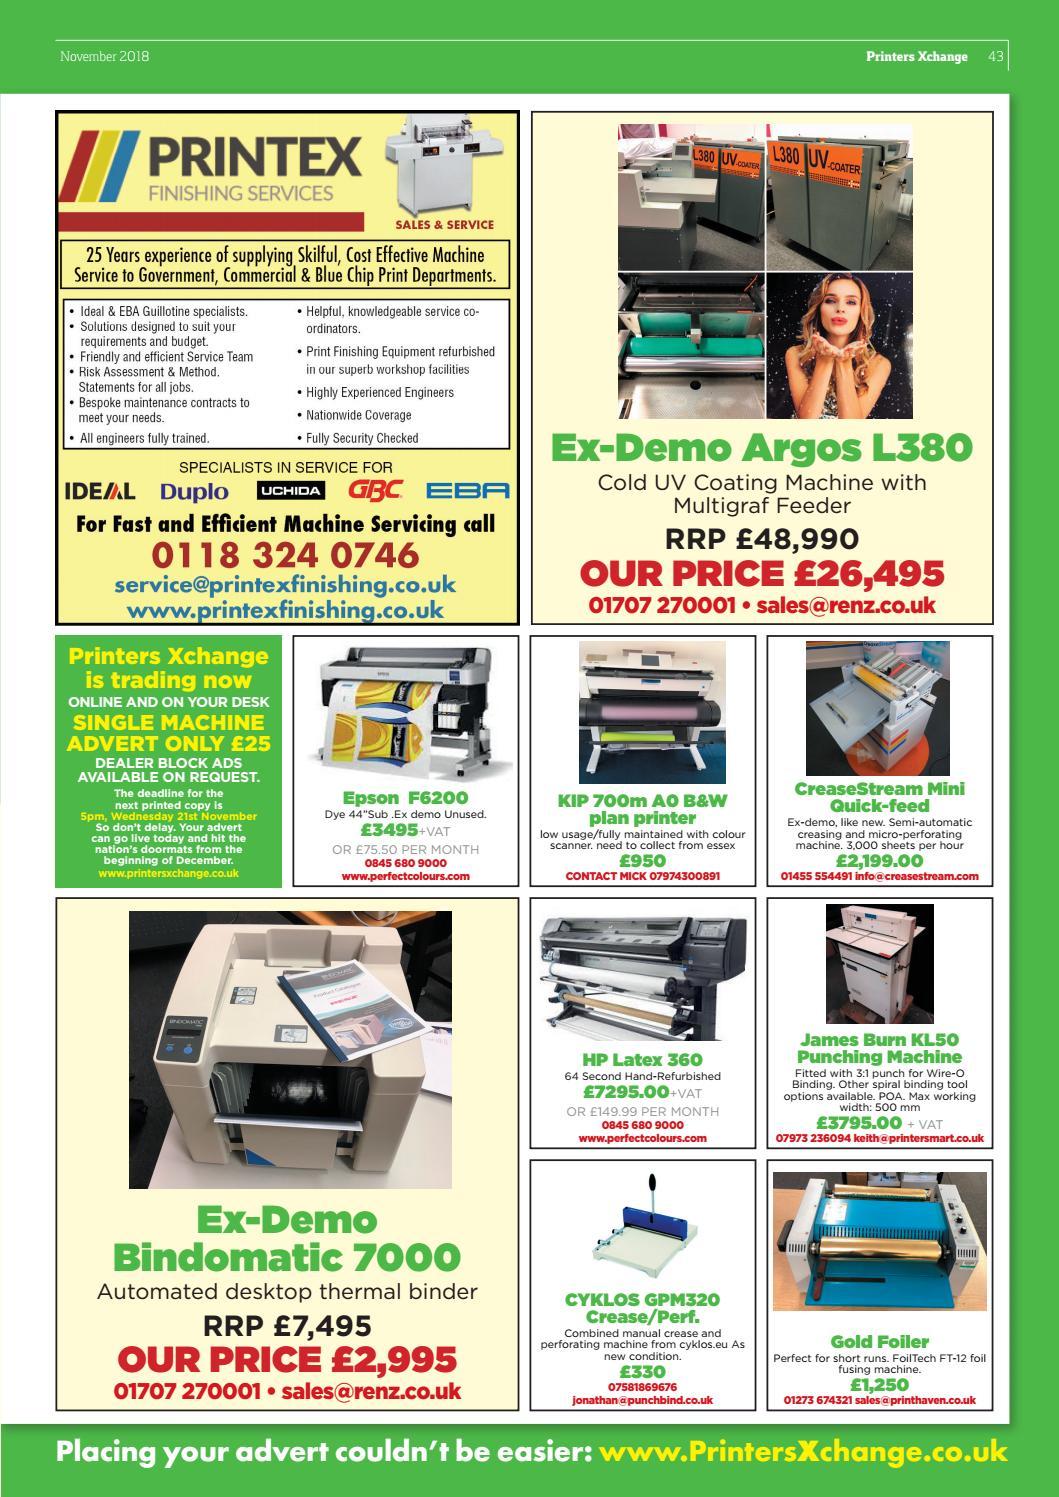 Quick Print Pro, November 2018